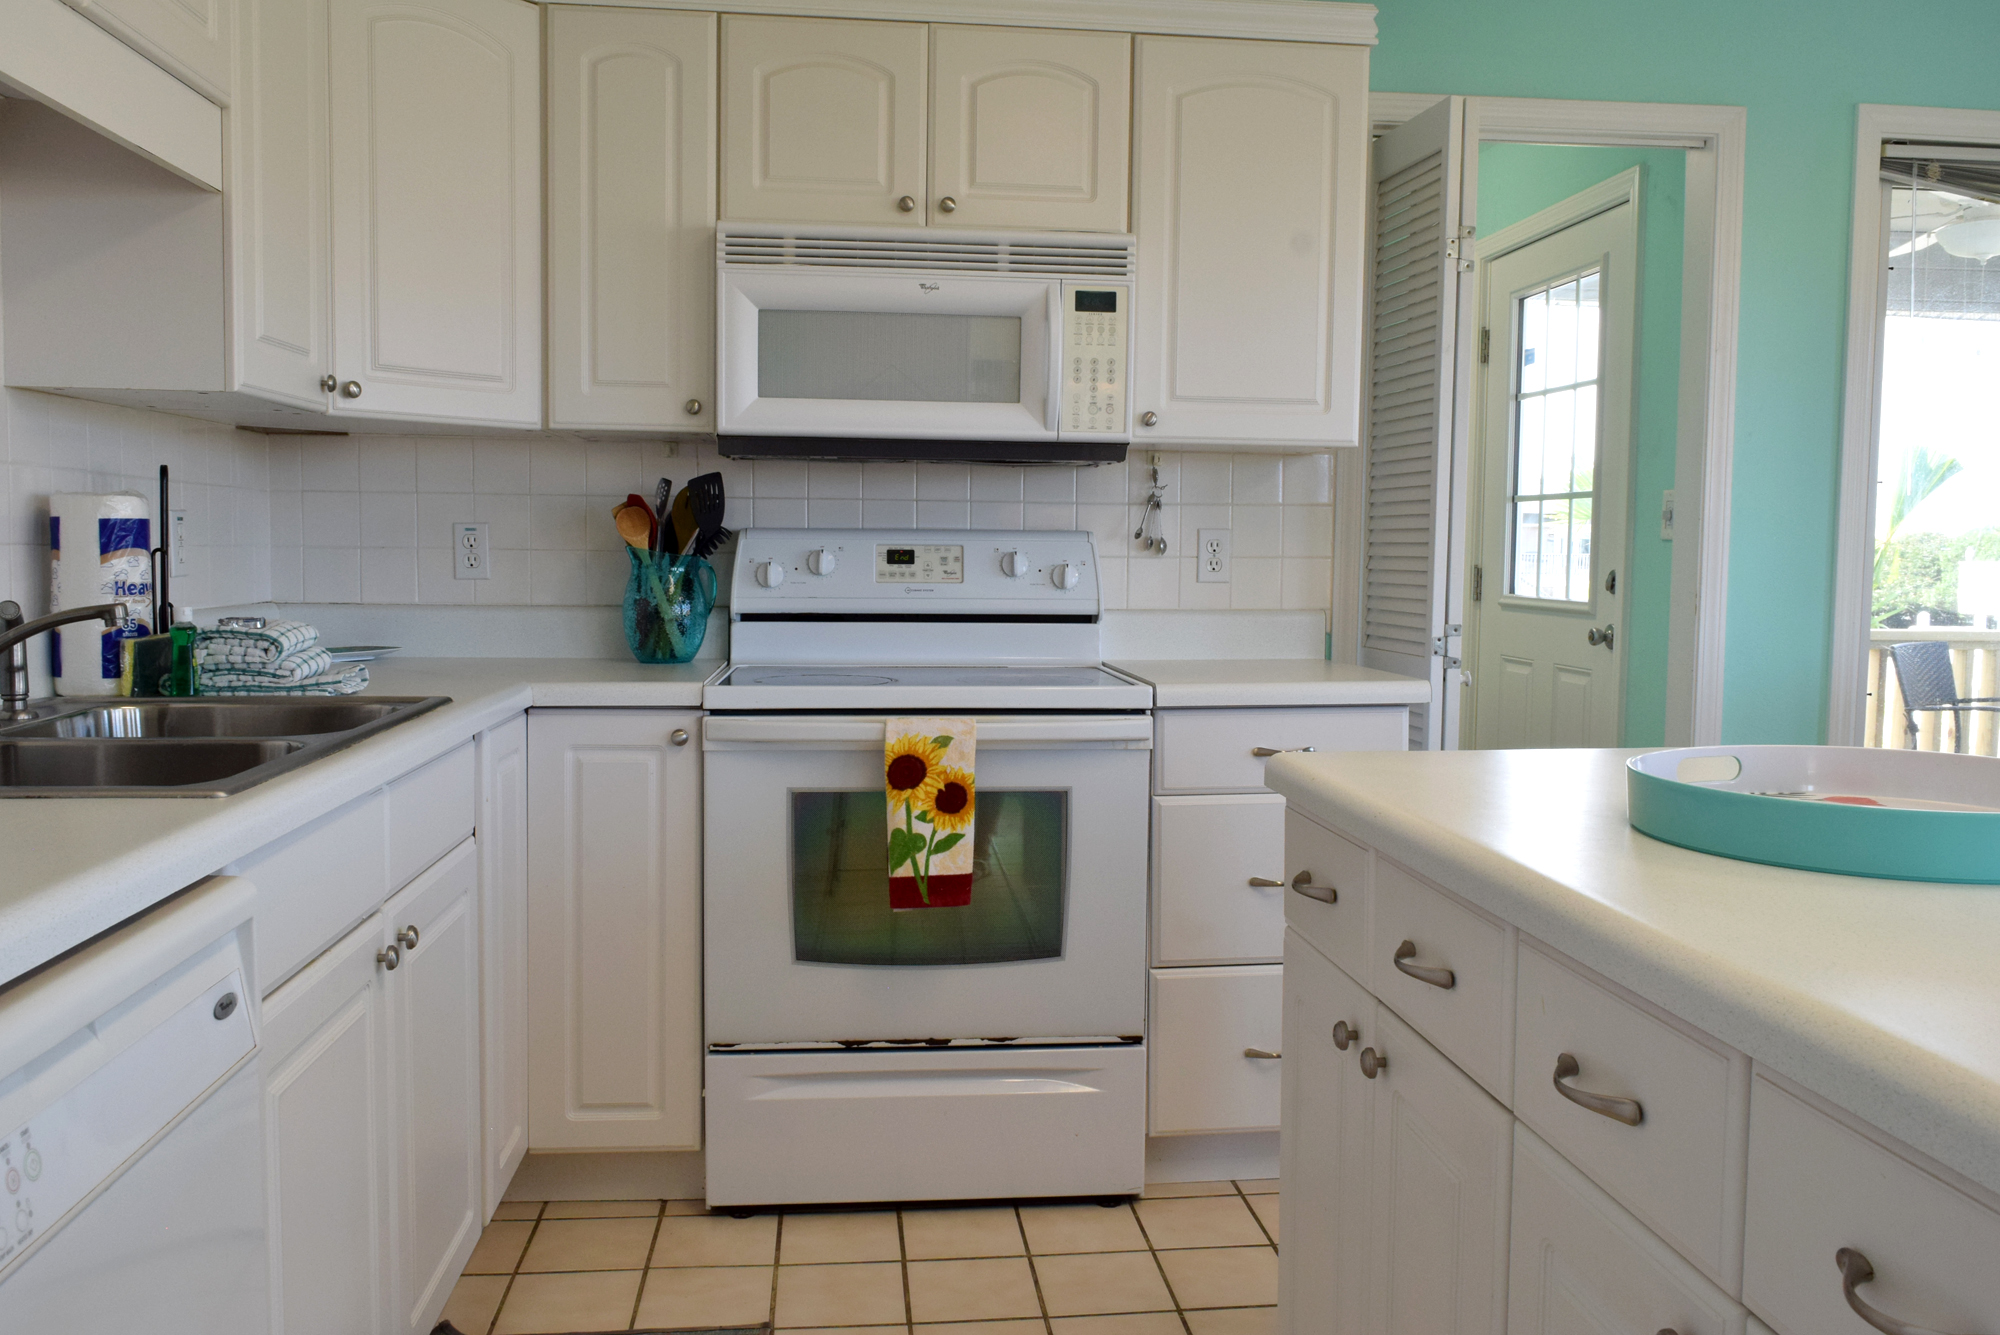 Maldonado 1103 House/Cottage rental in Pensacola Beach House Rentals in Pensacola Beach Florida - #8